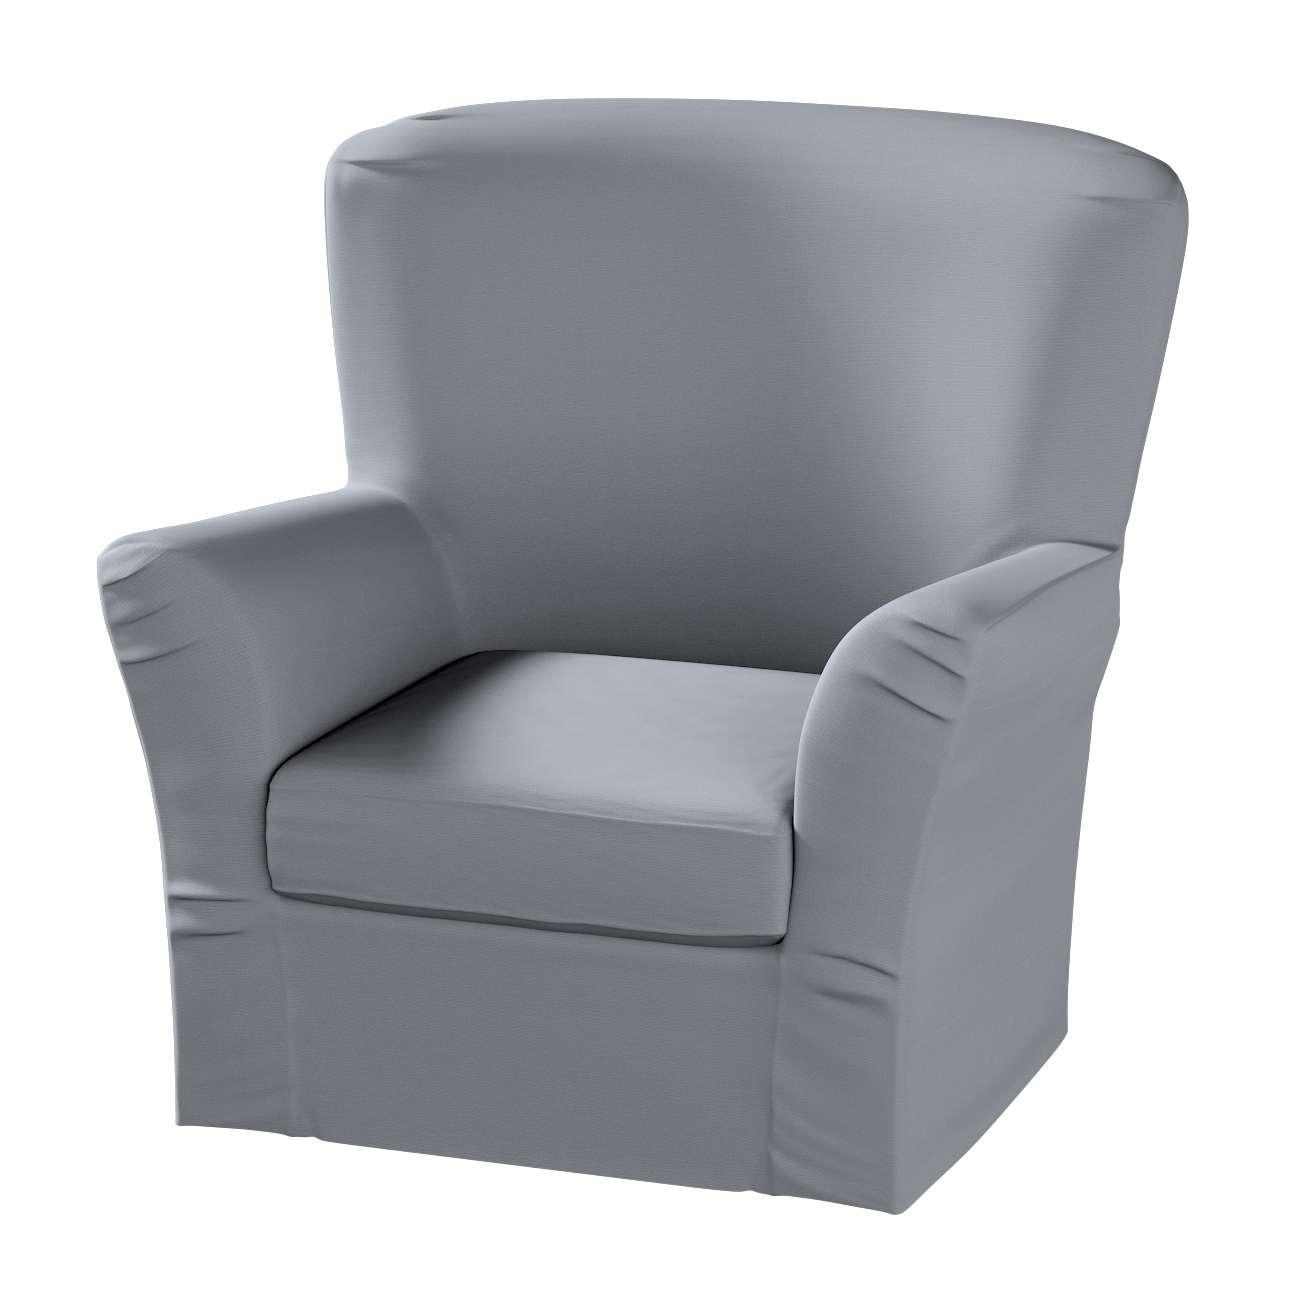 TOMELILLA fotelio užvalkalas TOMELILLA fotelis kolekcijoje Cotton Panama, audinys: 702-07